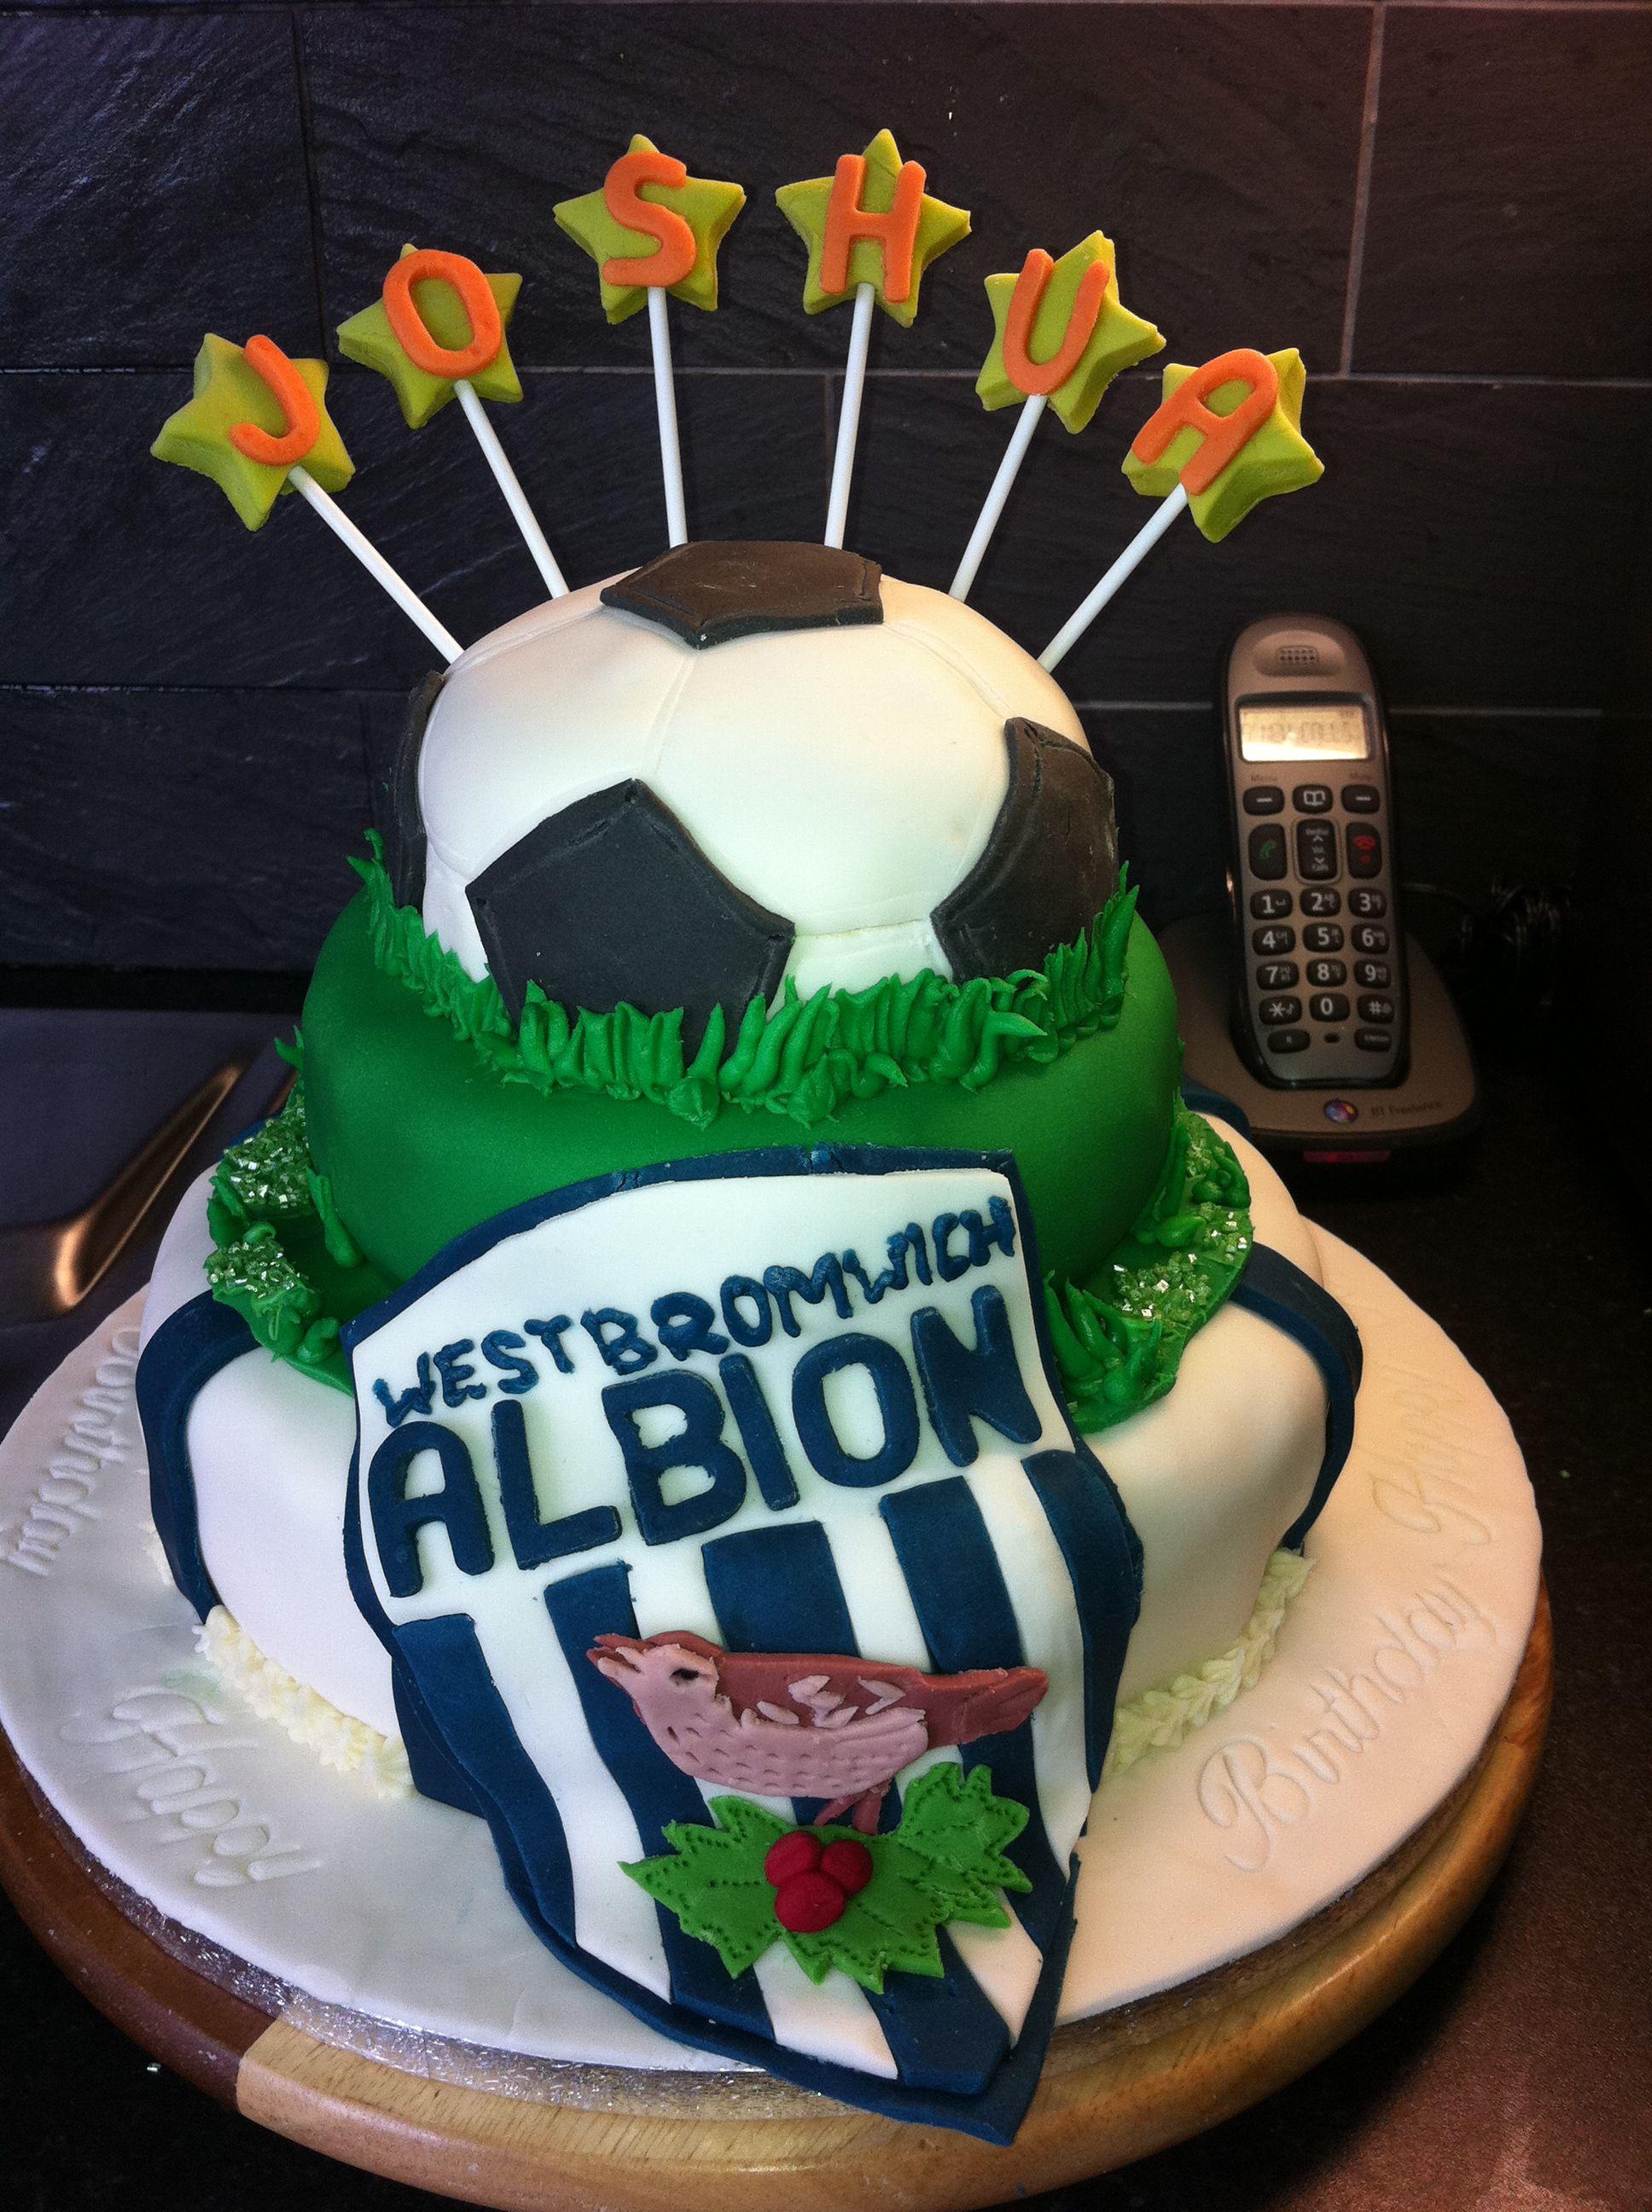 West Bromwich Albion Birthday Cake